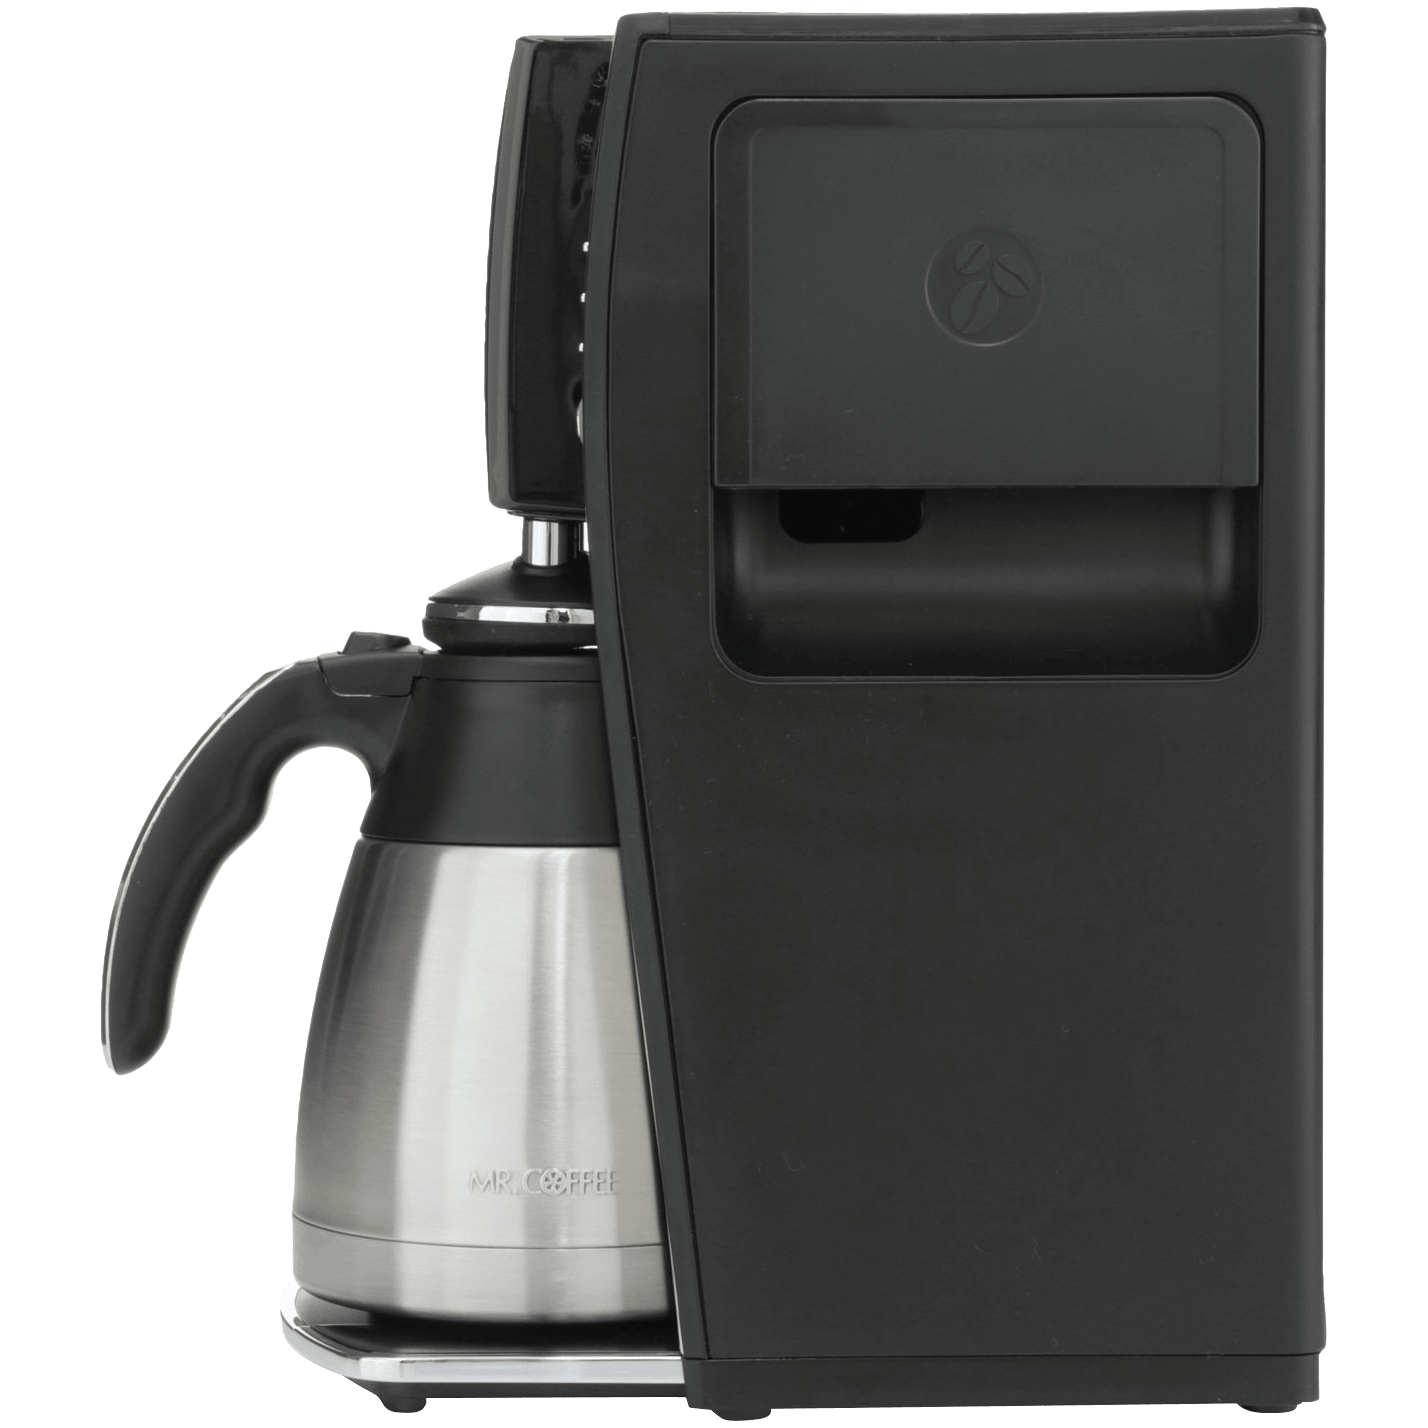 Mr. Coffee 10-Cup Thermal Carafe Coffee Maker (Refurbished)